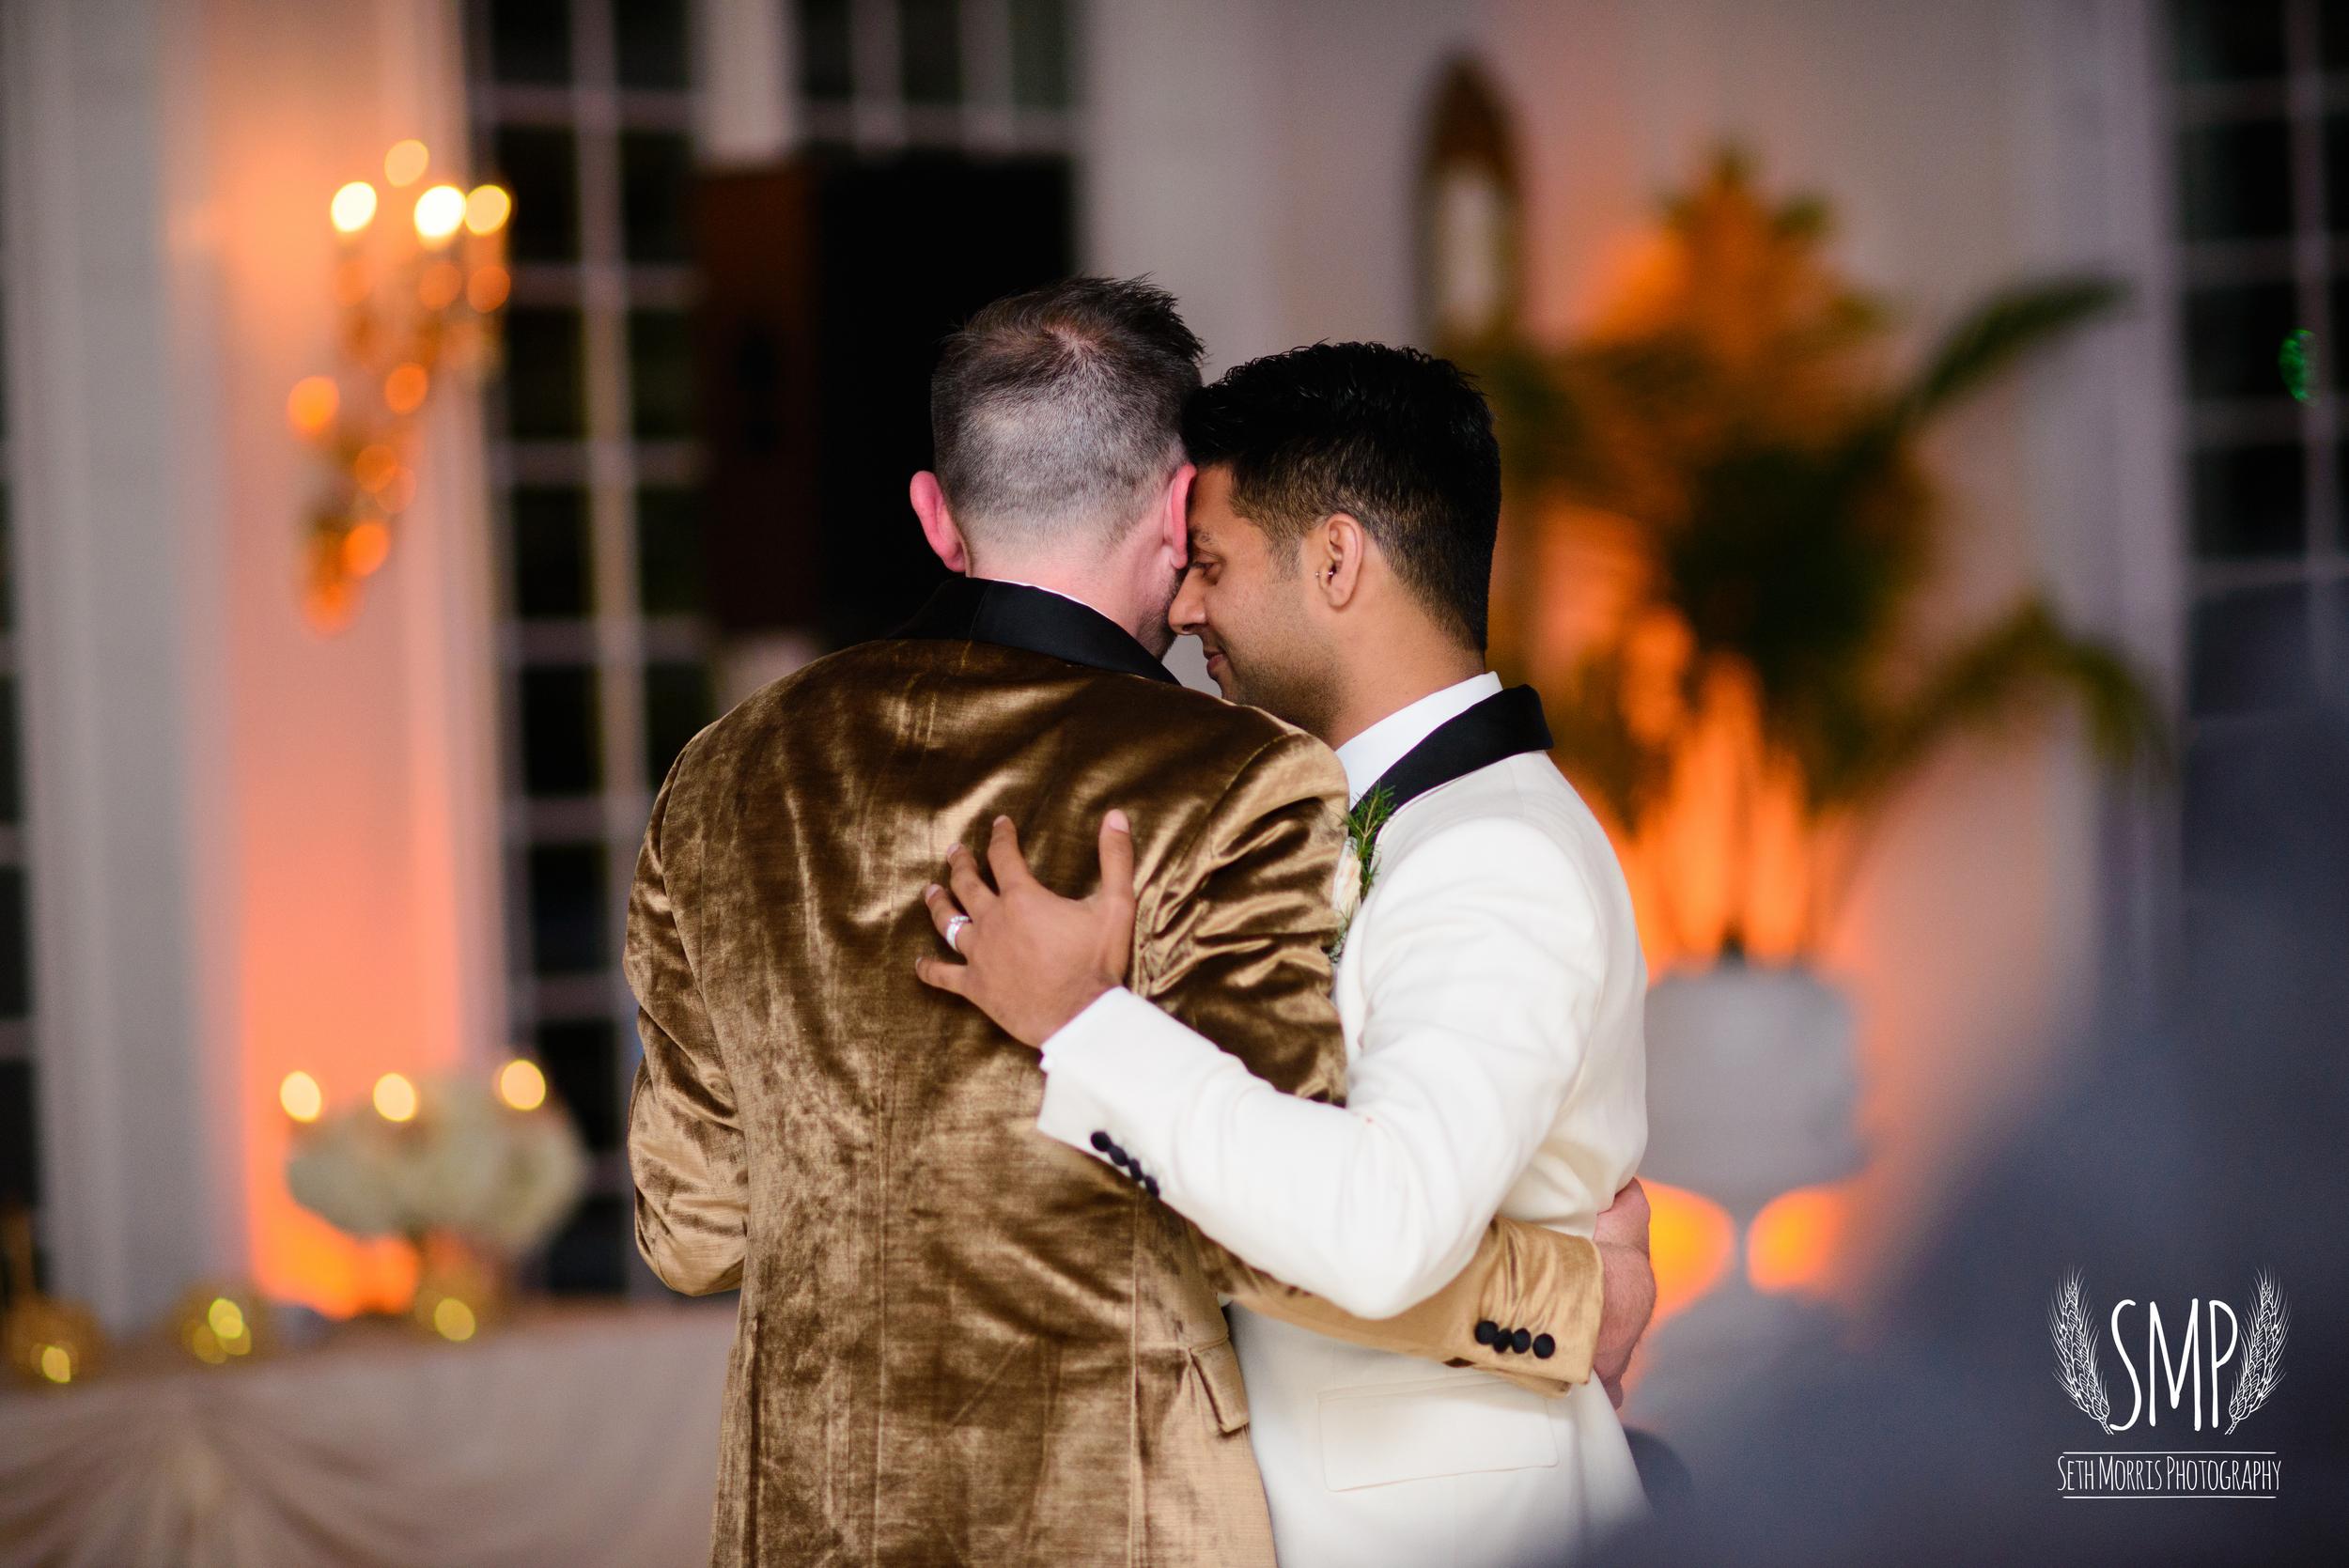 same-sex-wedding-photographer-chicago-illinois-111.jpg